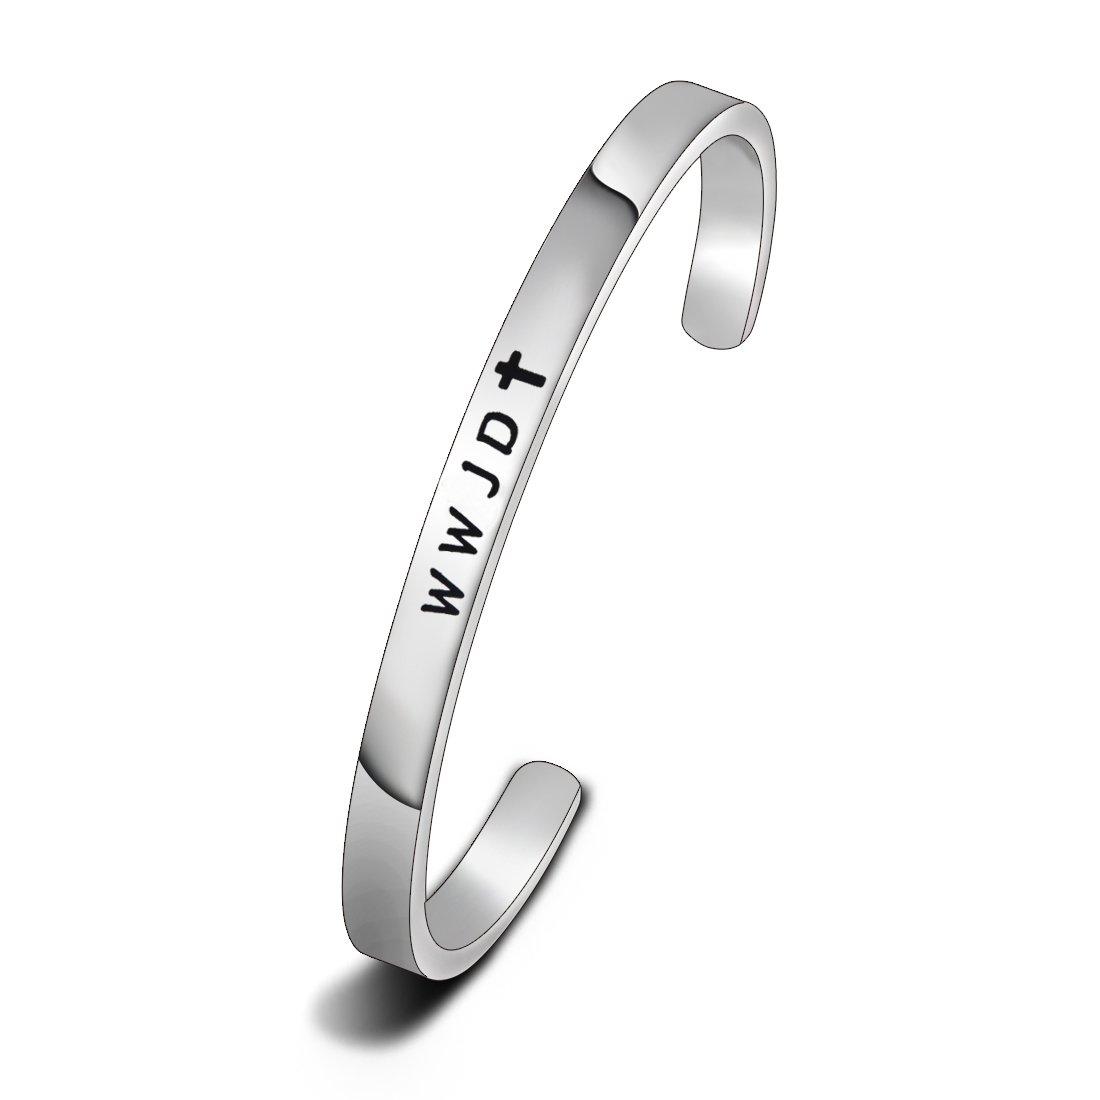 WUSUANED Religious Jewelry WWJD Cross Cuff Bracelet Bangle First Communion Gift (WWJD)